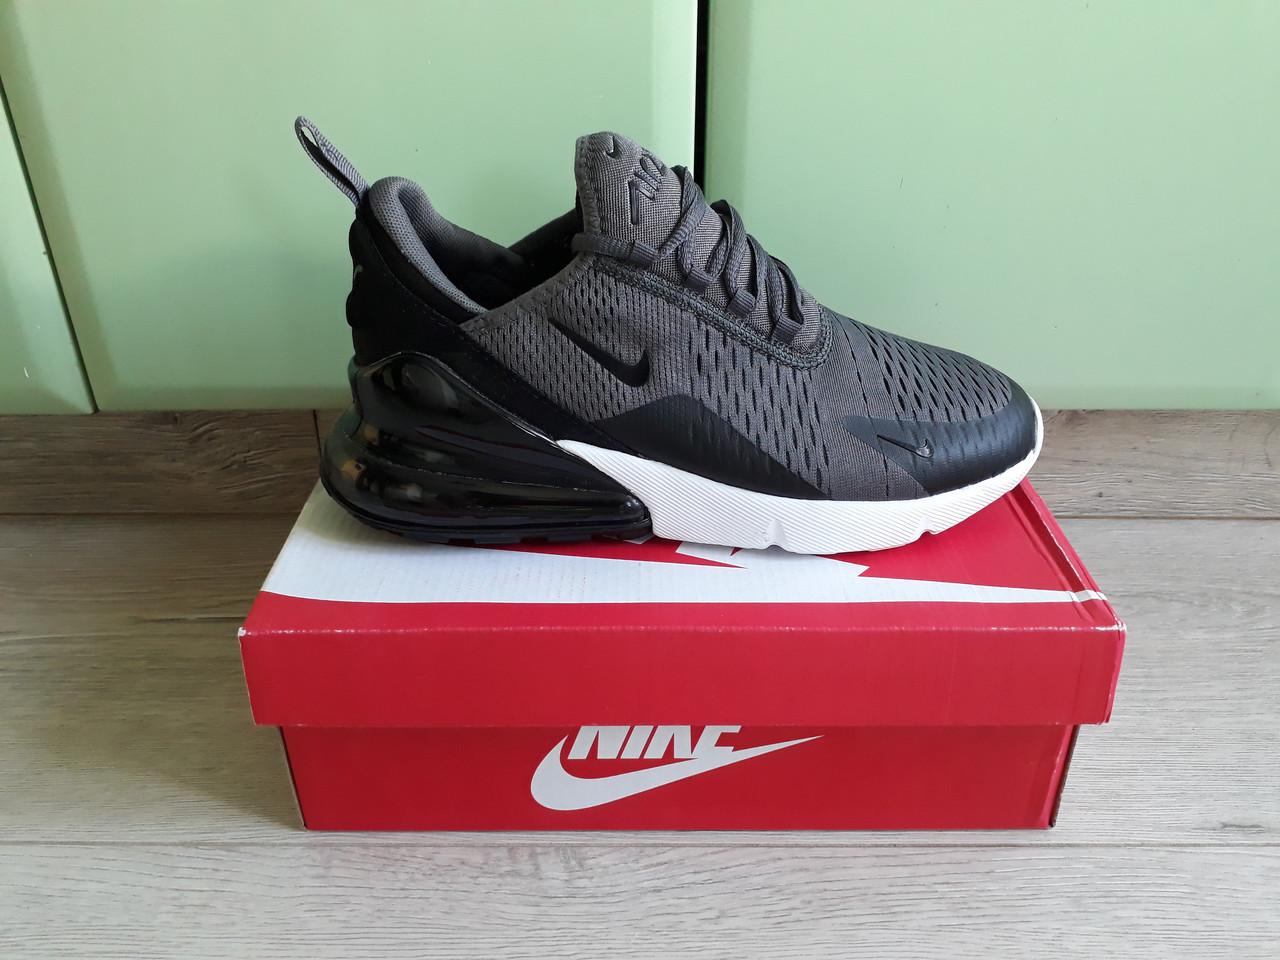 1058d033c1dfa3 Мужские кроссовки Nike Air Max 270 Grey/White топ реплика, много цветов в  наличии